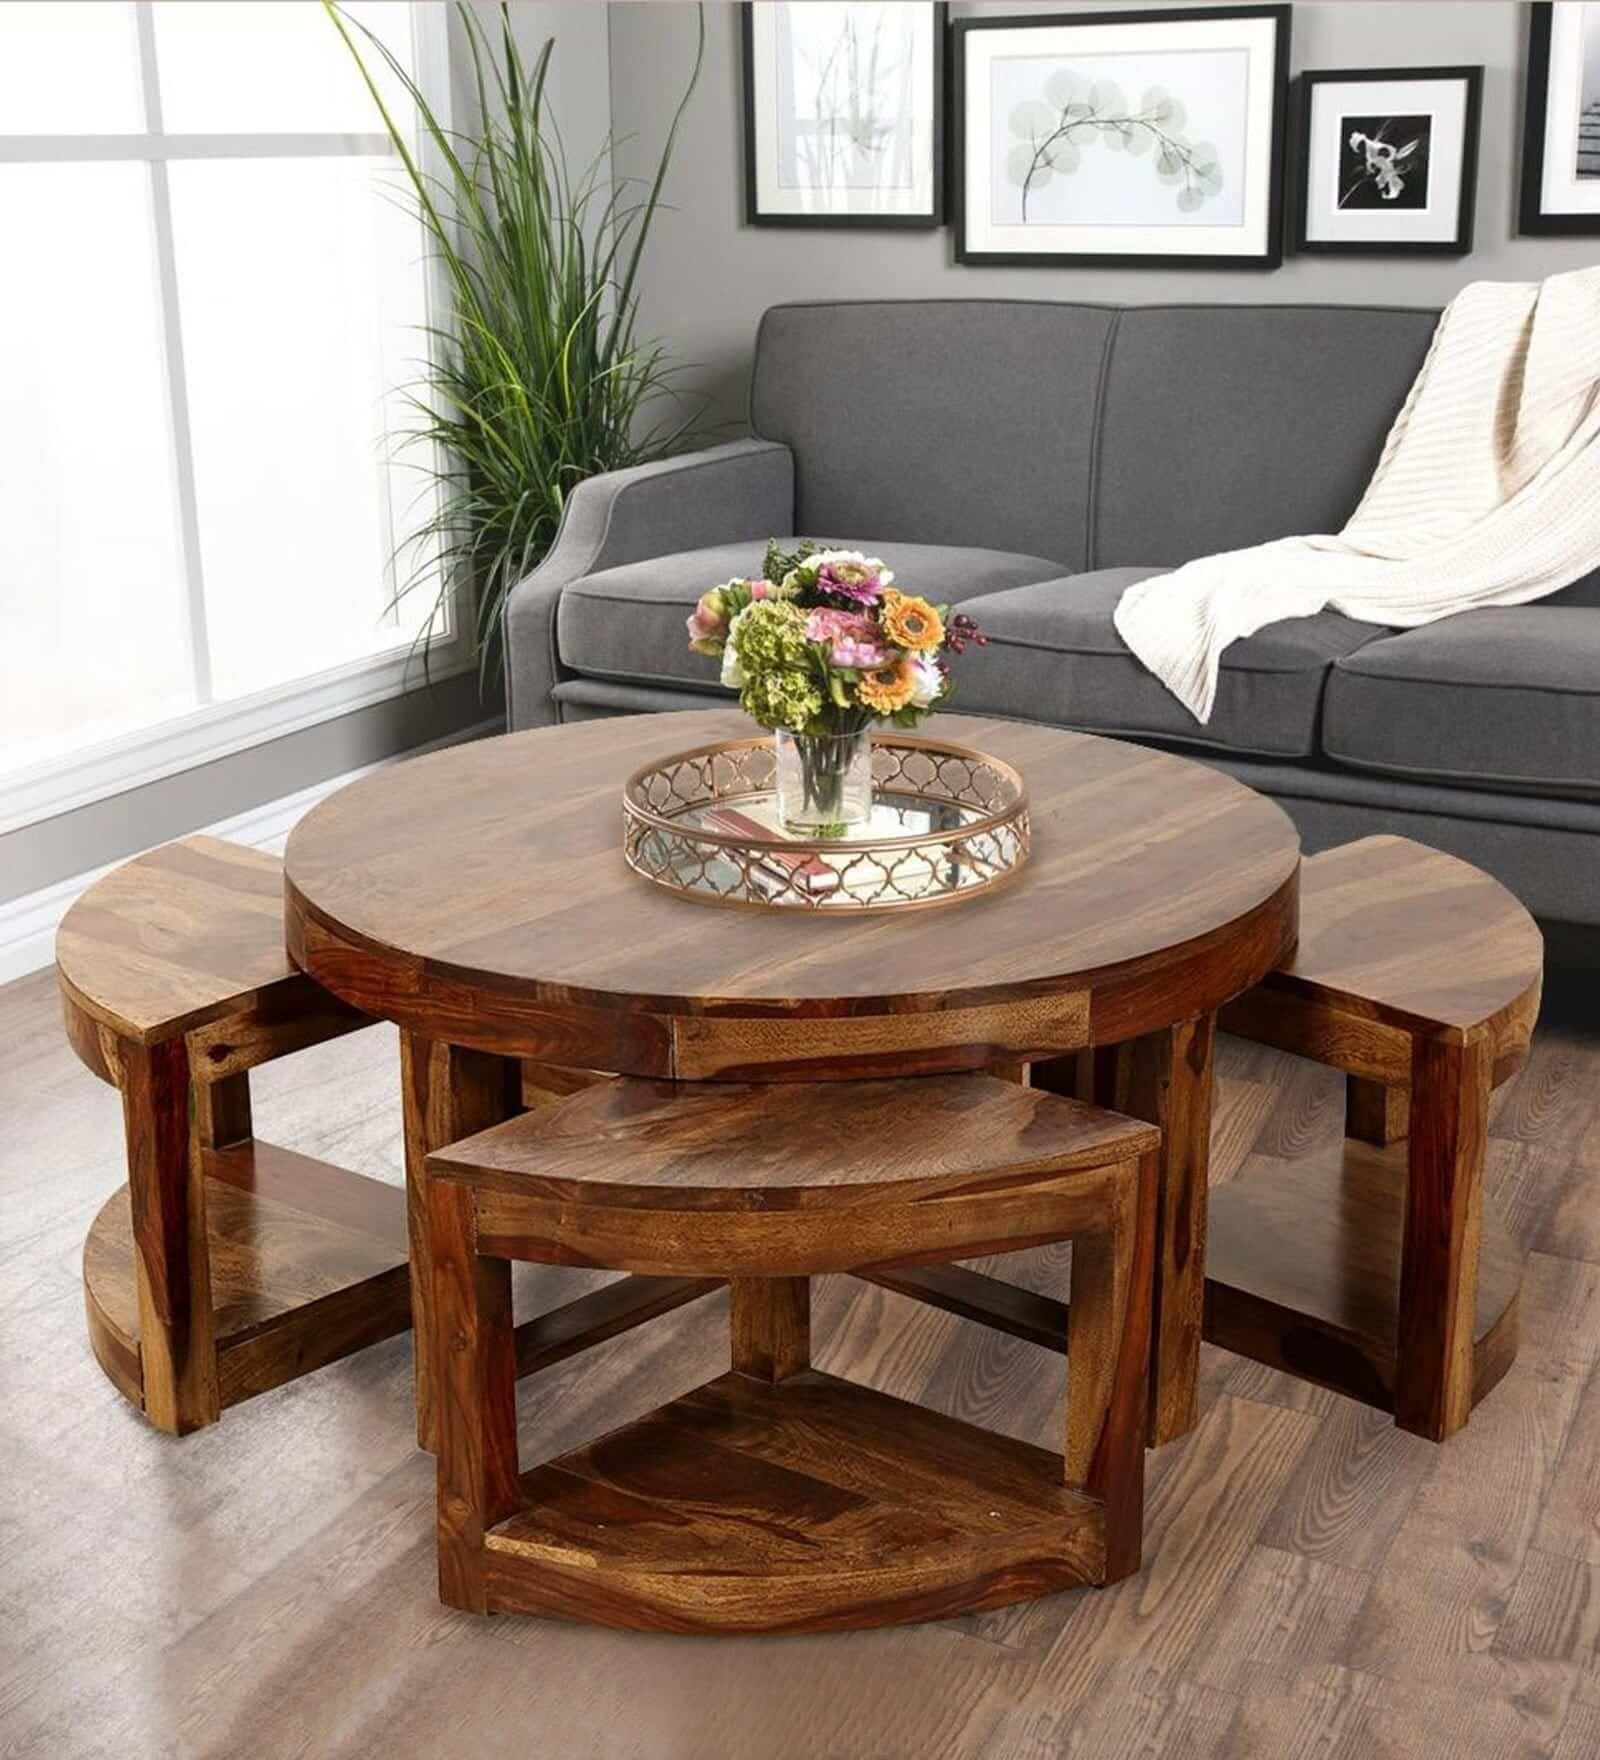 Sheesham Wood Furniture Vs Mango Wood Furniture Vs Teak Wood Sheesham Wood Furniture Coffee Table Living Room Coffee Table [ 1760 x 1600 Pixel ]